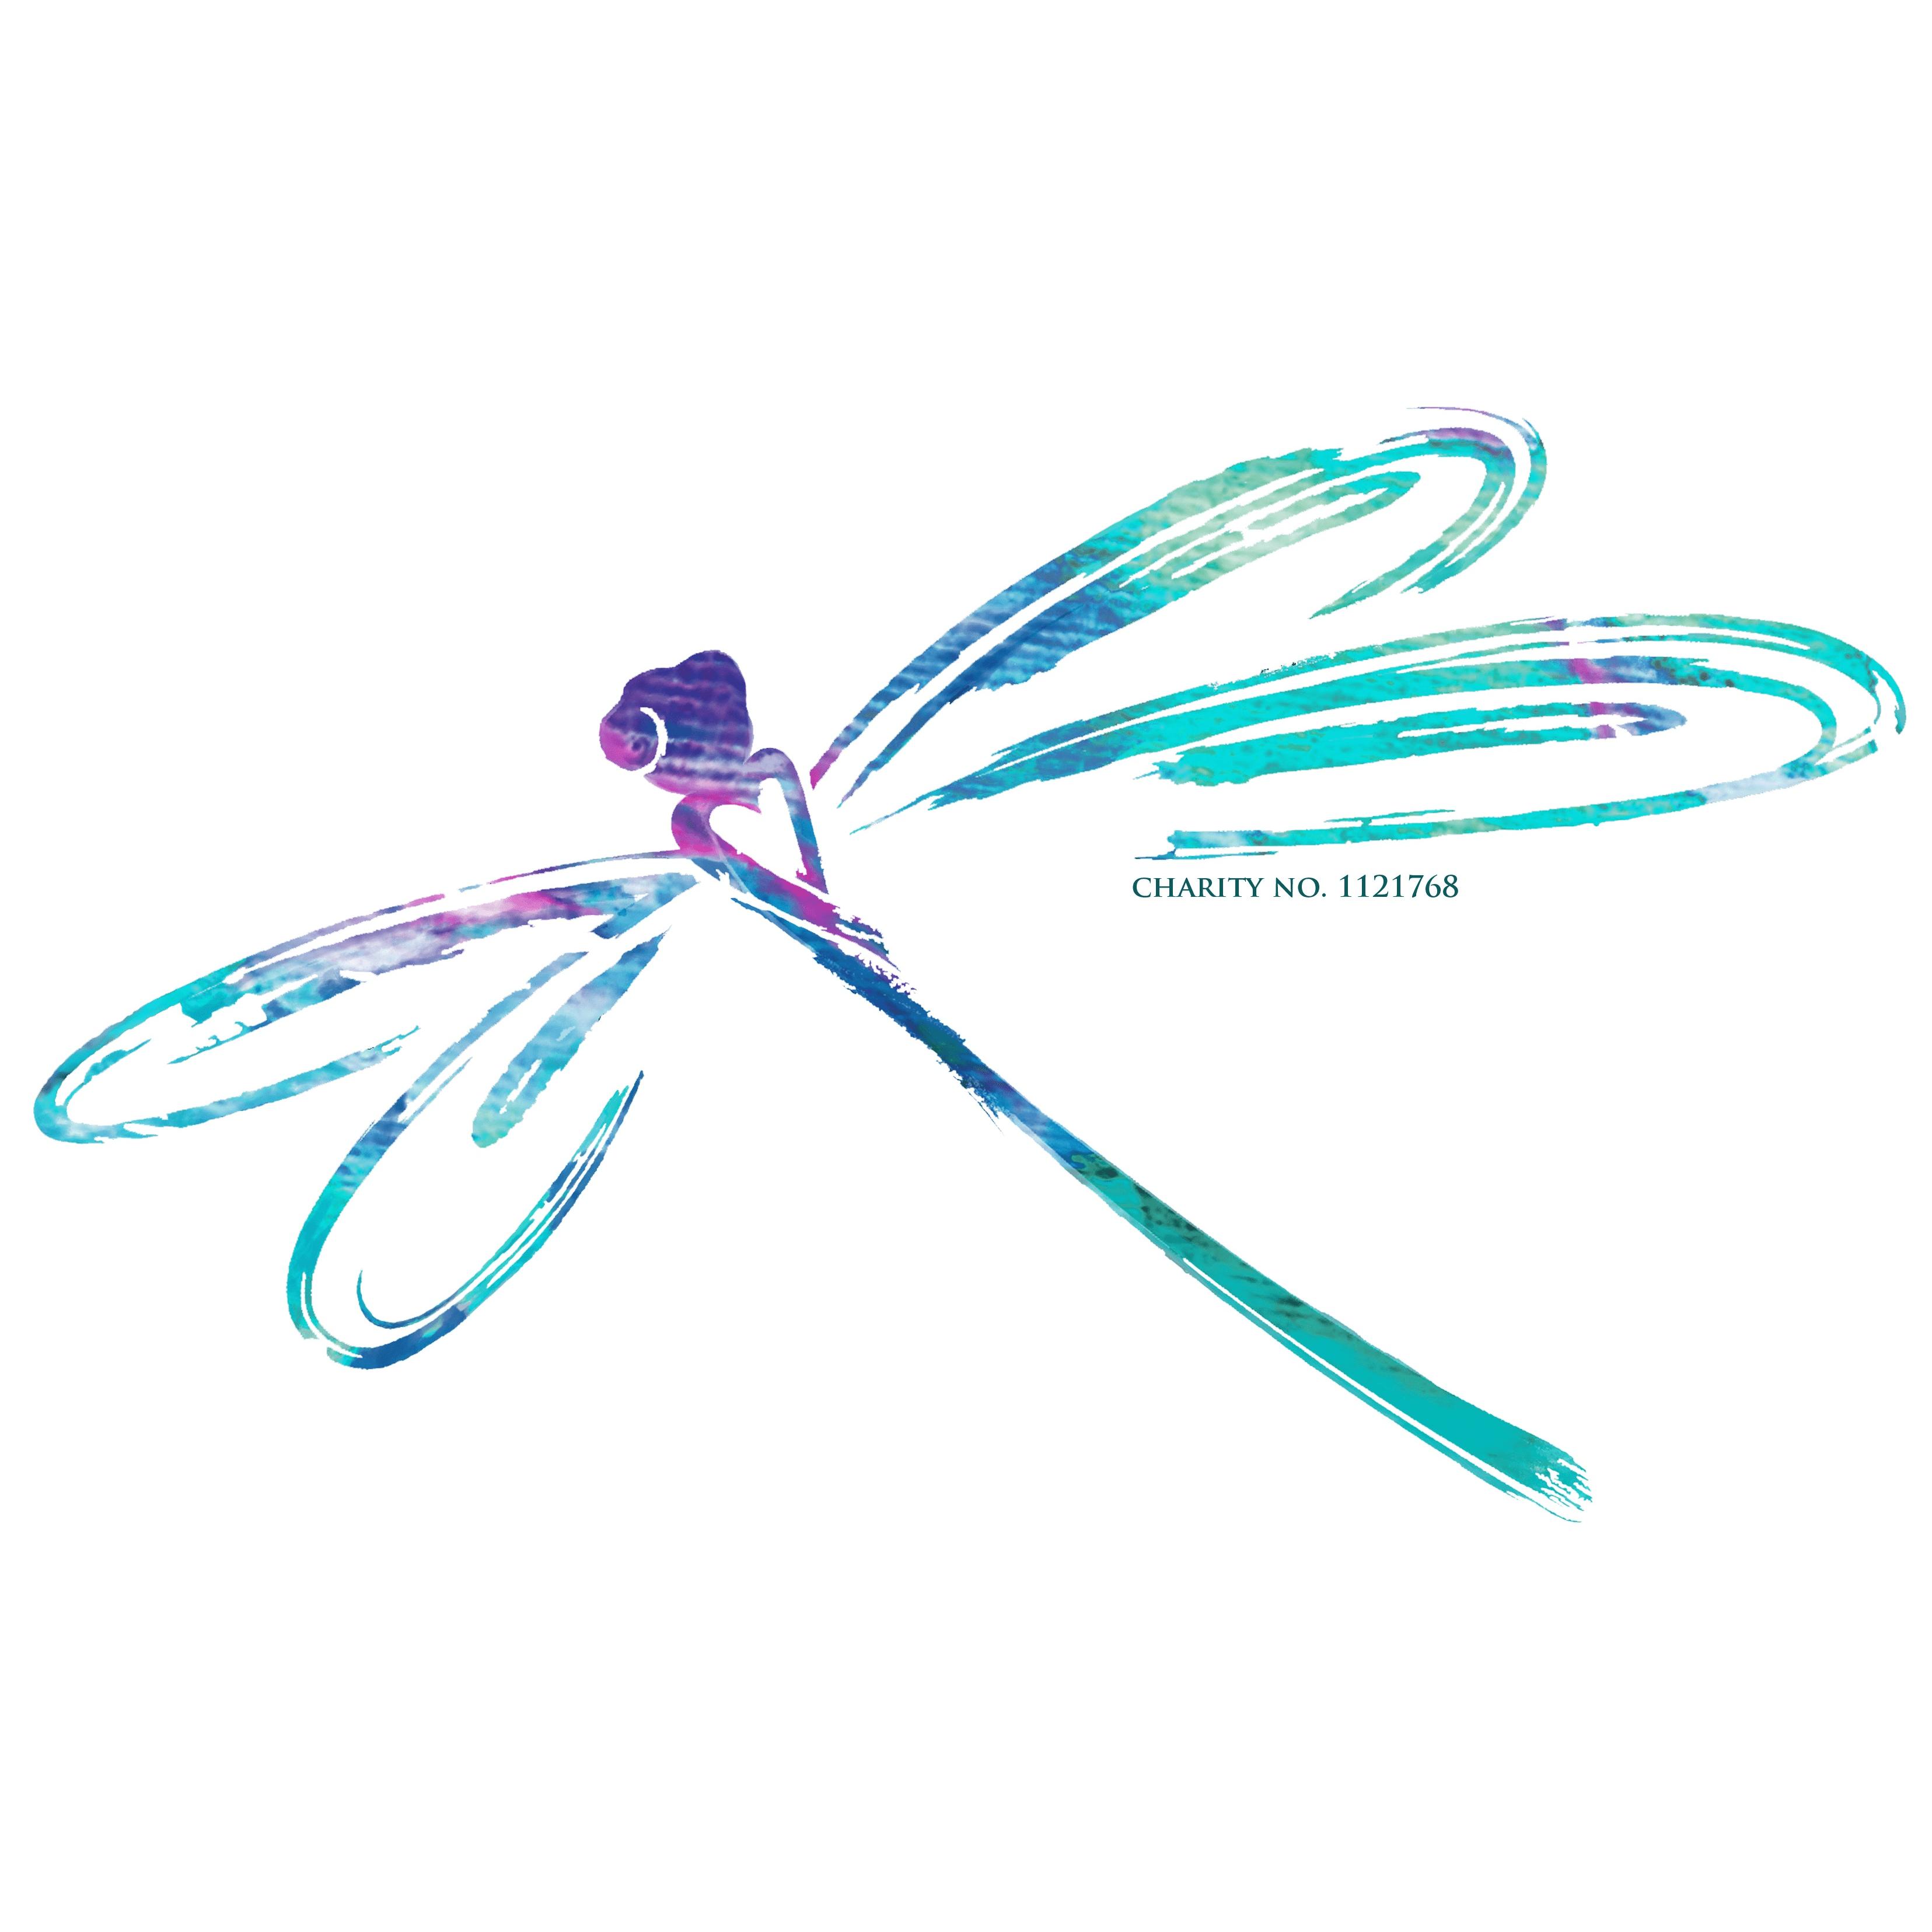 Dragonfly Cancer Trust